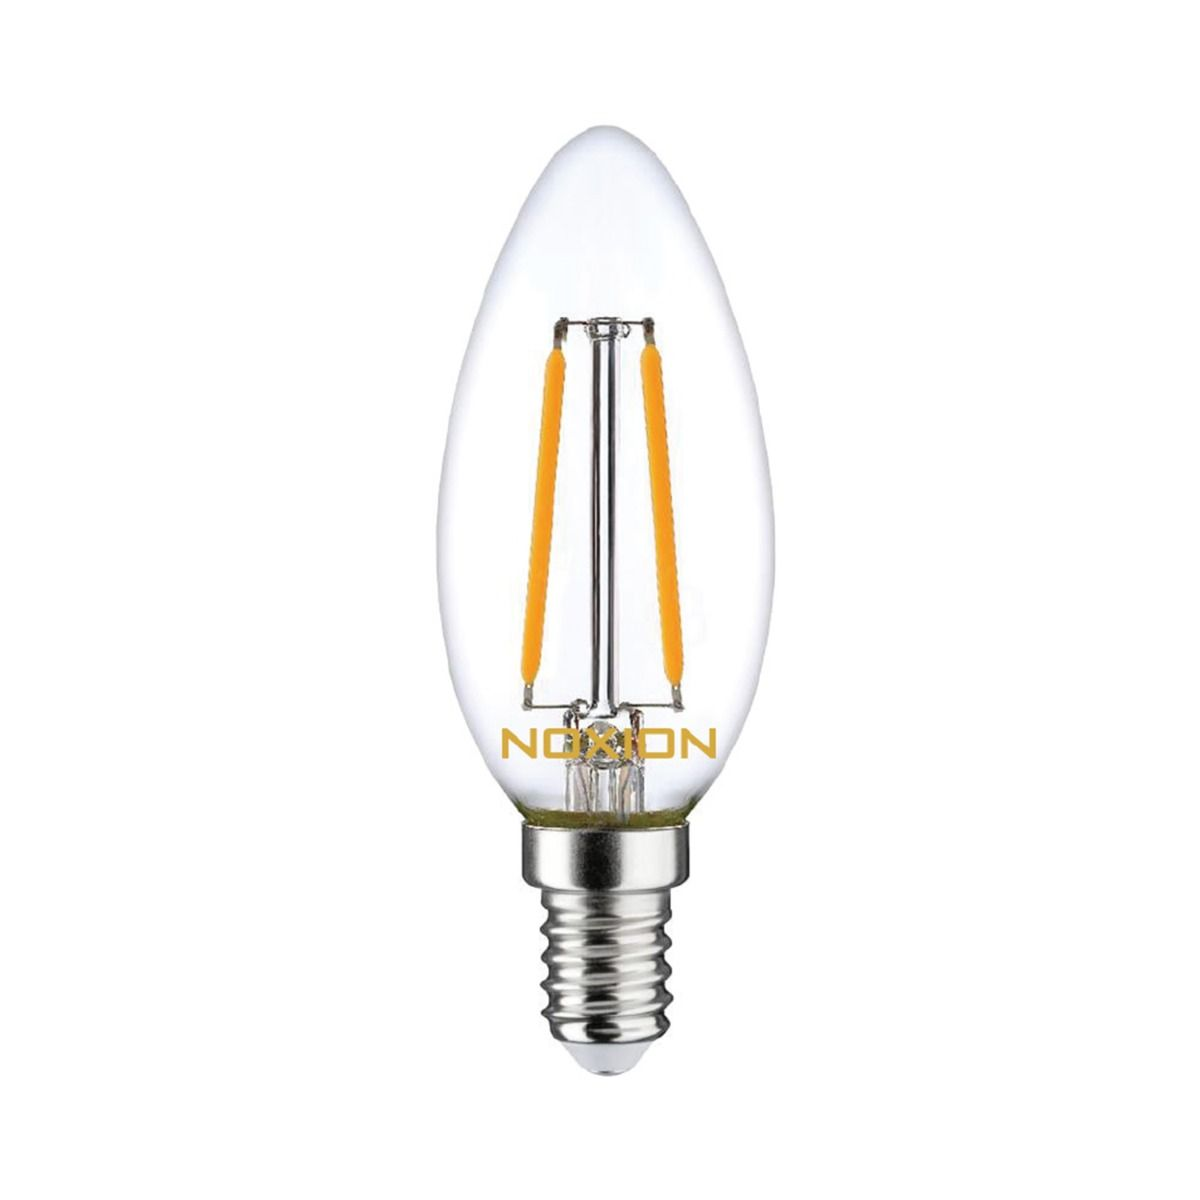 Noxion Lucent Kooldraad LED Candle 2.5W 827 B35 E14 Helder | Vervanger voor 25W